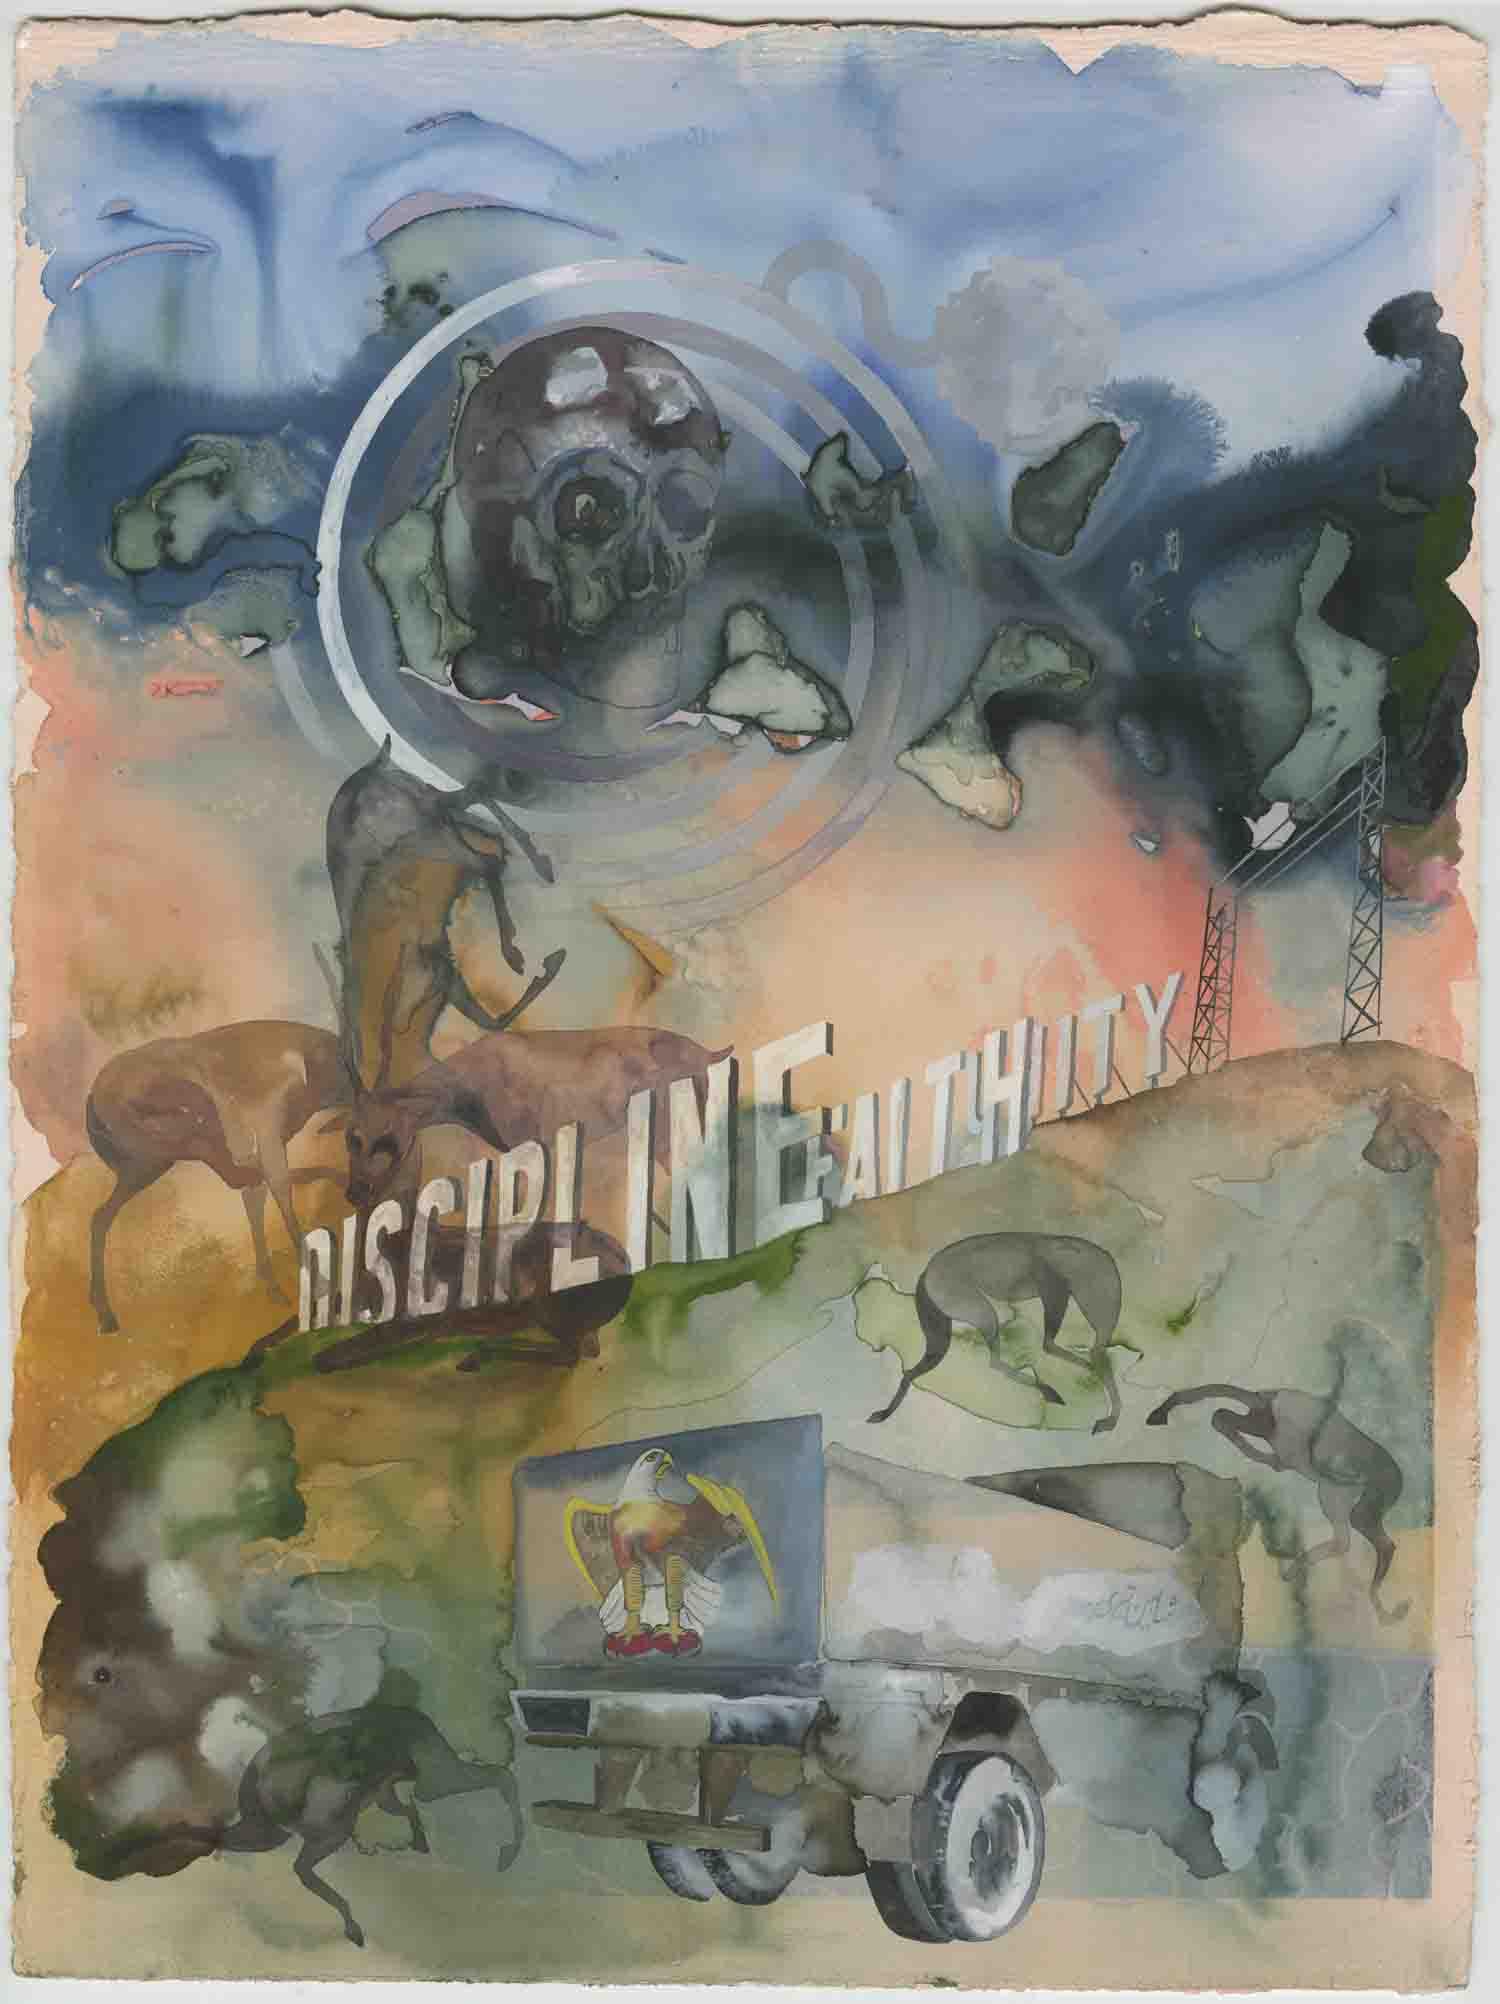 """Headless wonders"" 2010, inchiostro e gouache su carta, 38.1 x 28.3 cm"